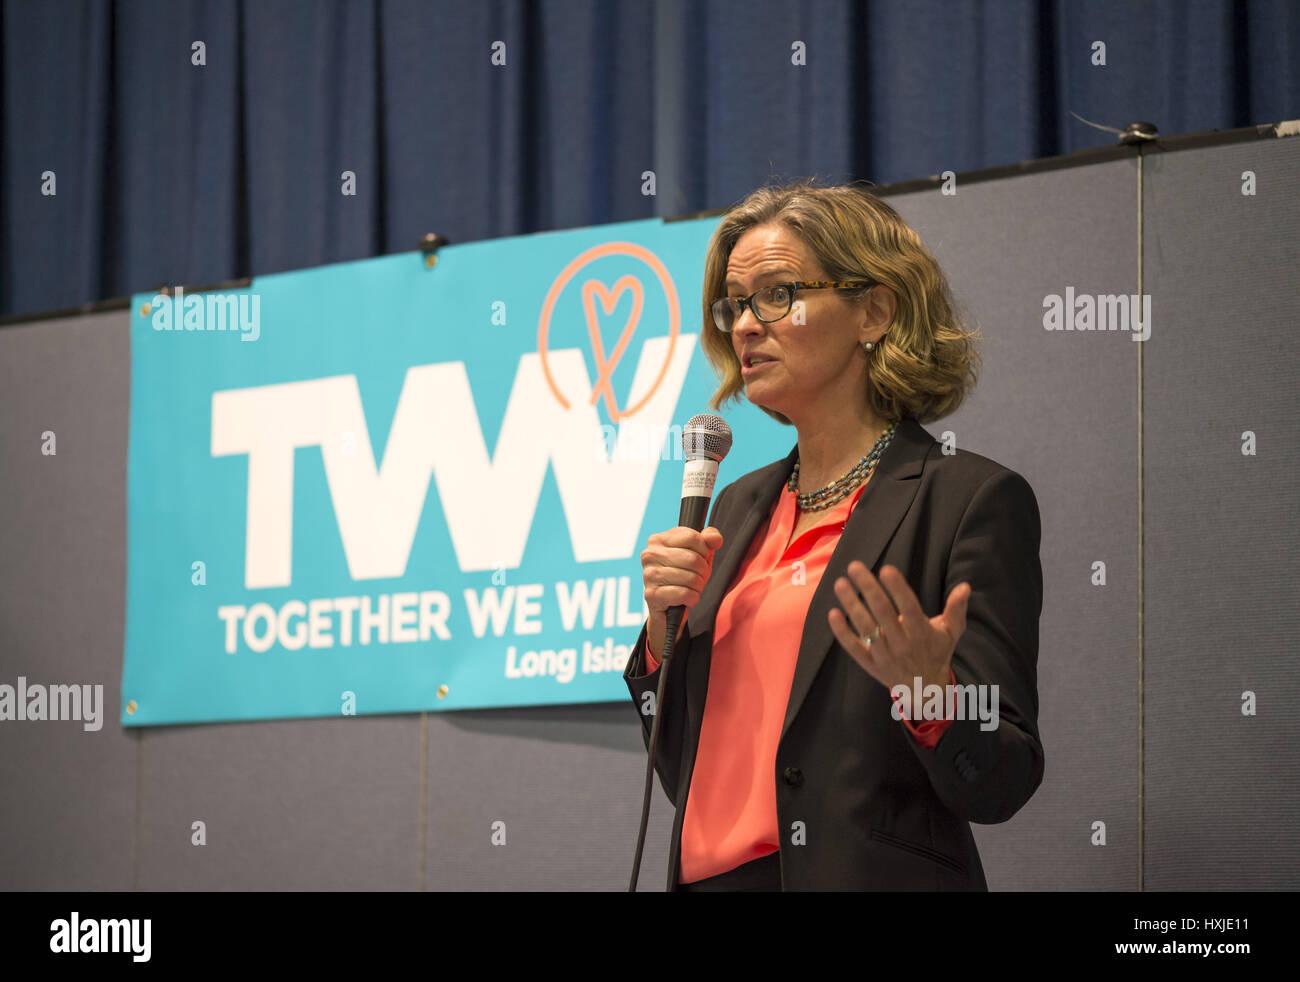 Wyandanch, New York, USA. 26th Mar, 2017. LAURA CURRAN, Nassau County Legislator (Democrat - District 5) speaks - Stock Image